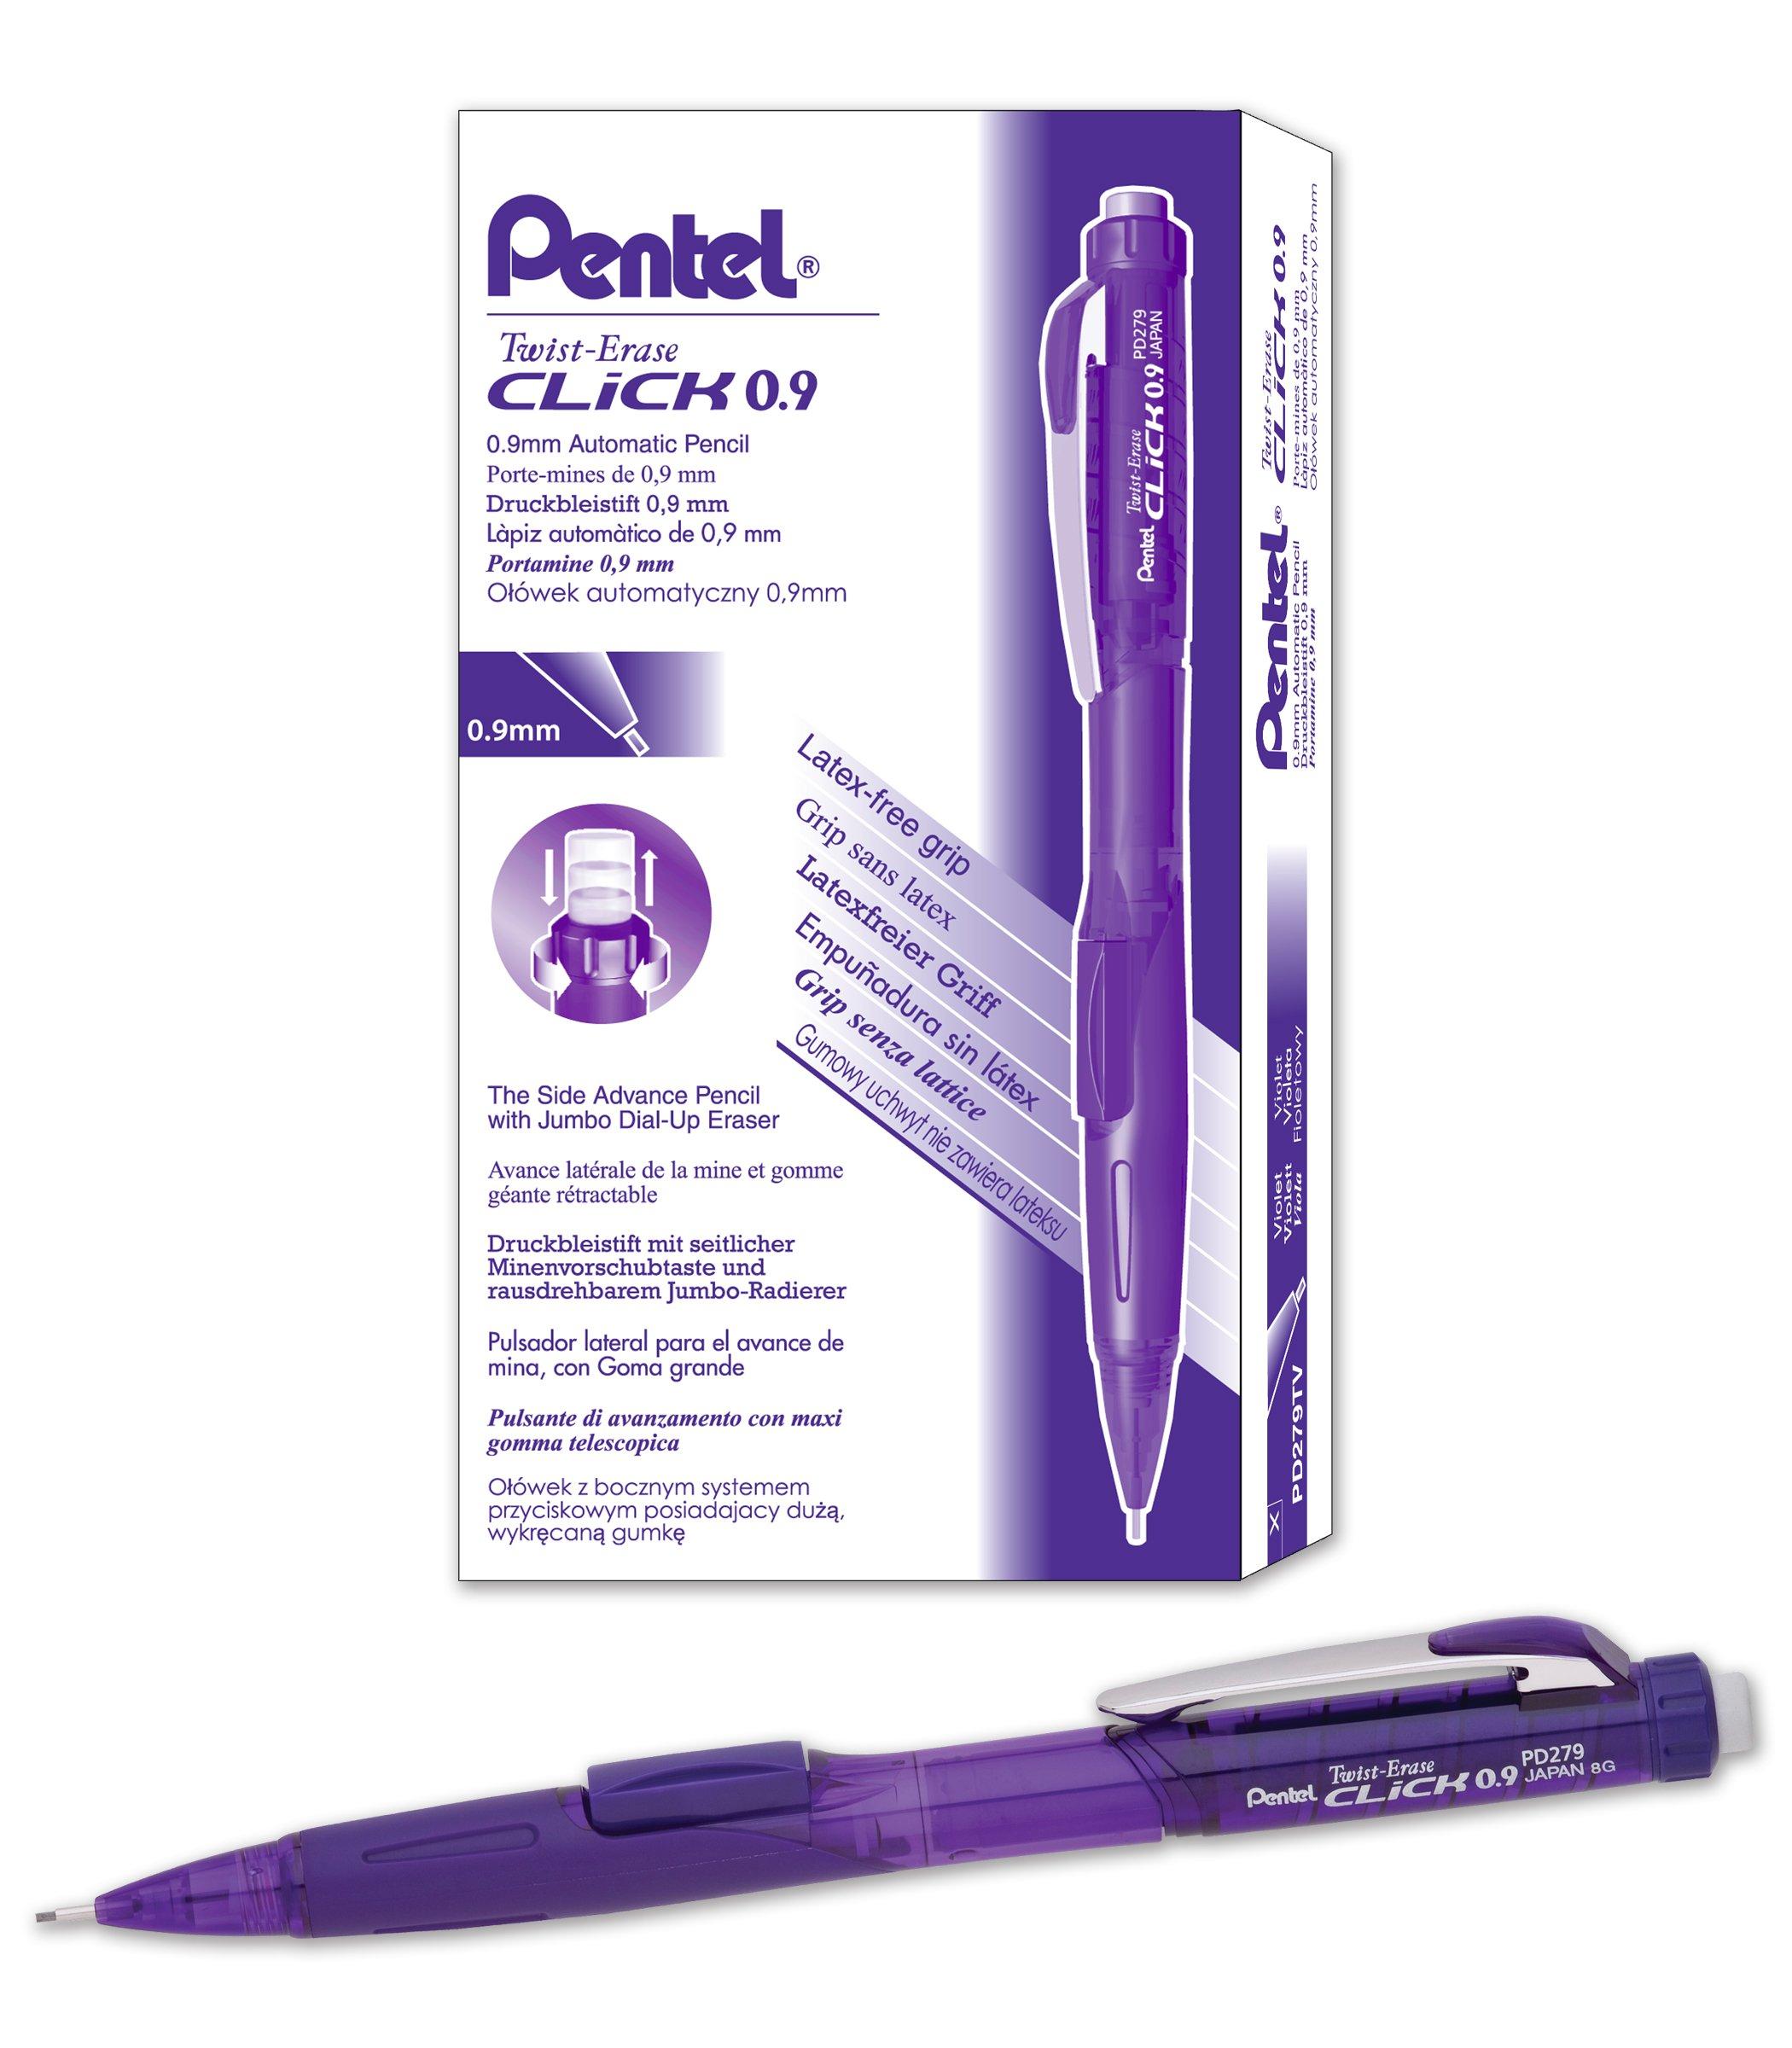 Pentel Twist-Erase CLICK Mechanical Pencil (0.9mm) Assorted Violet Barrel Colors, Color May Vary,  Box of 12 (PD279TV)